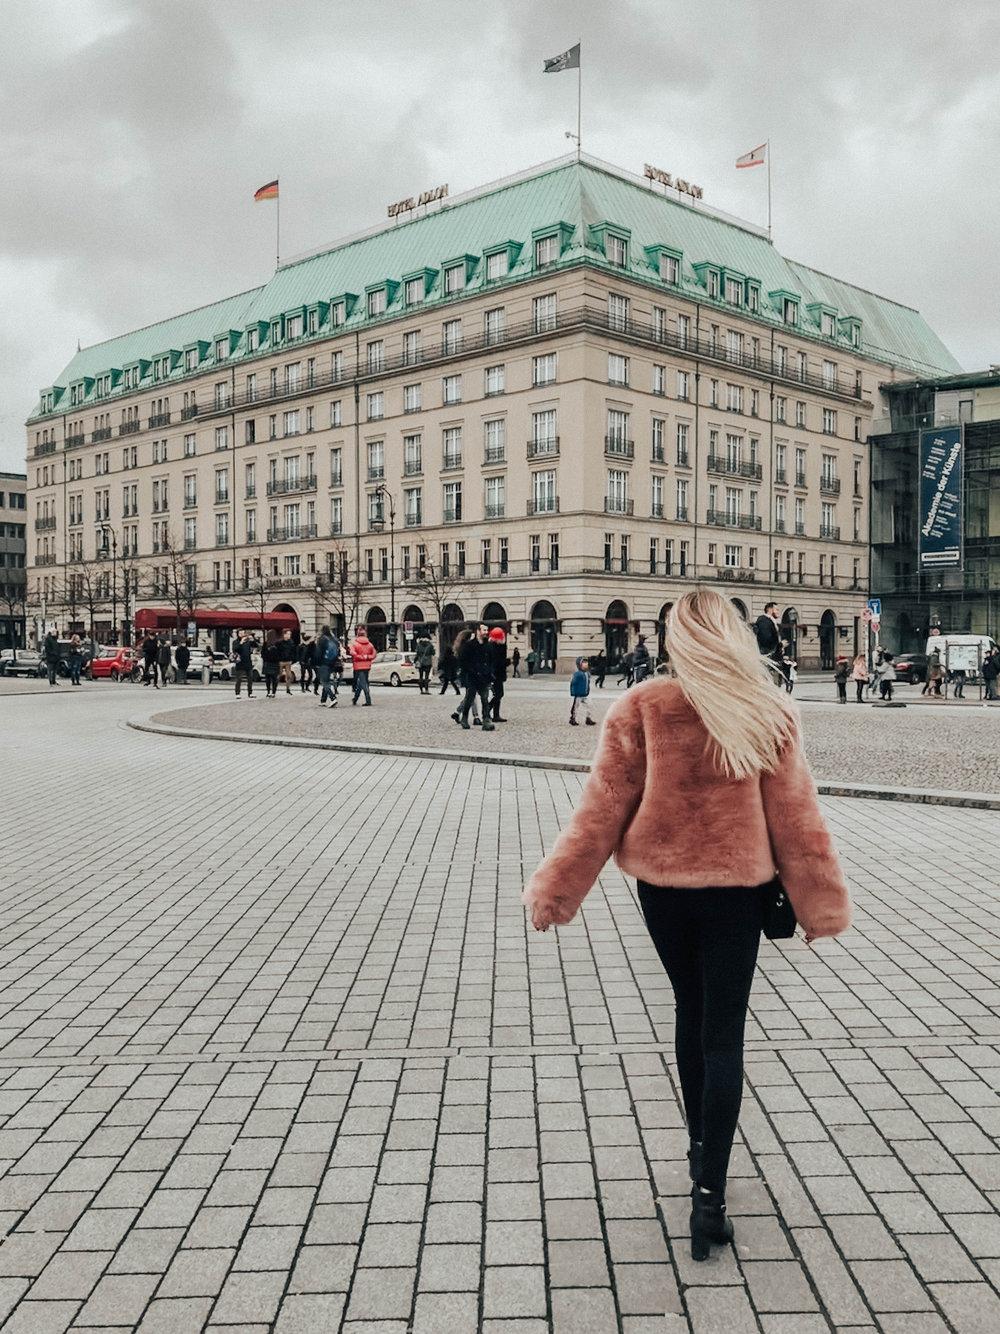 Blogger in Berlin, Germany